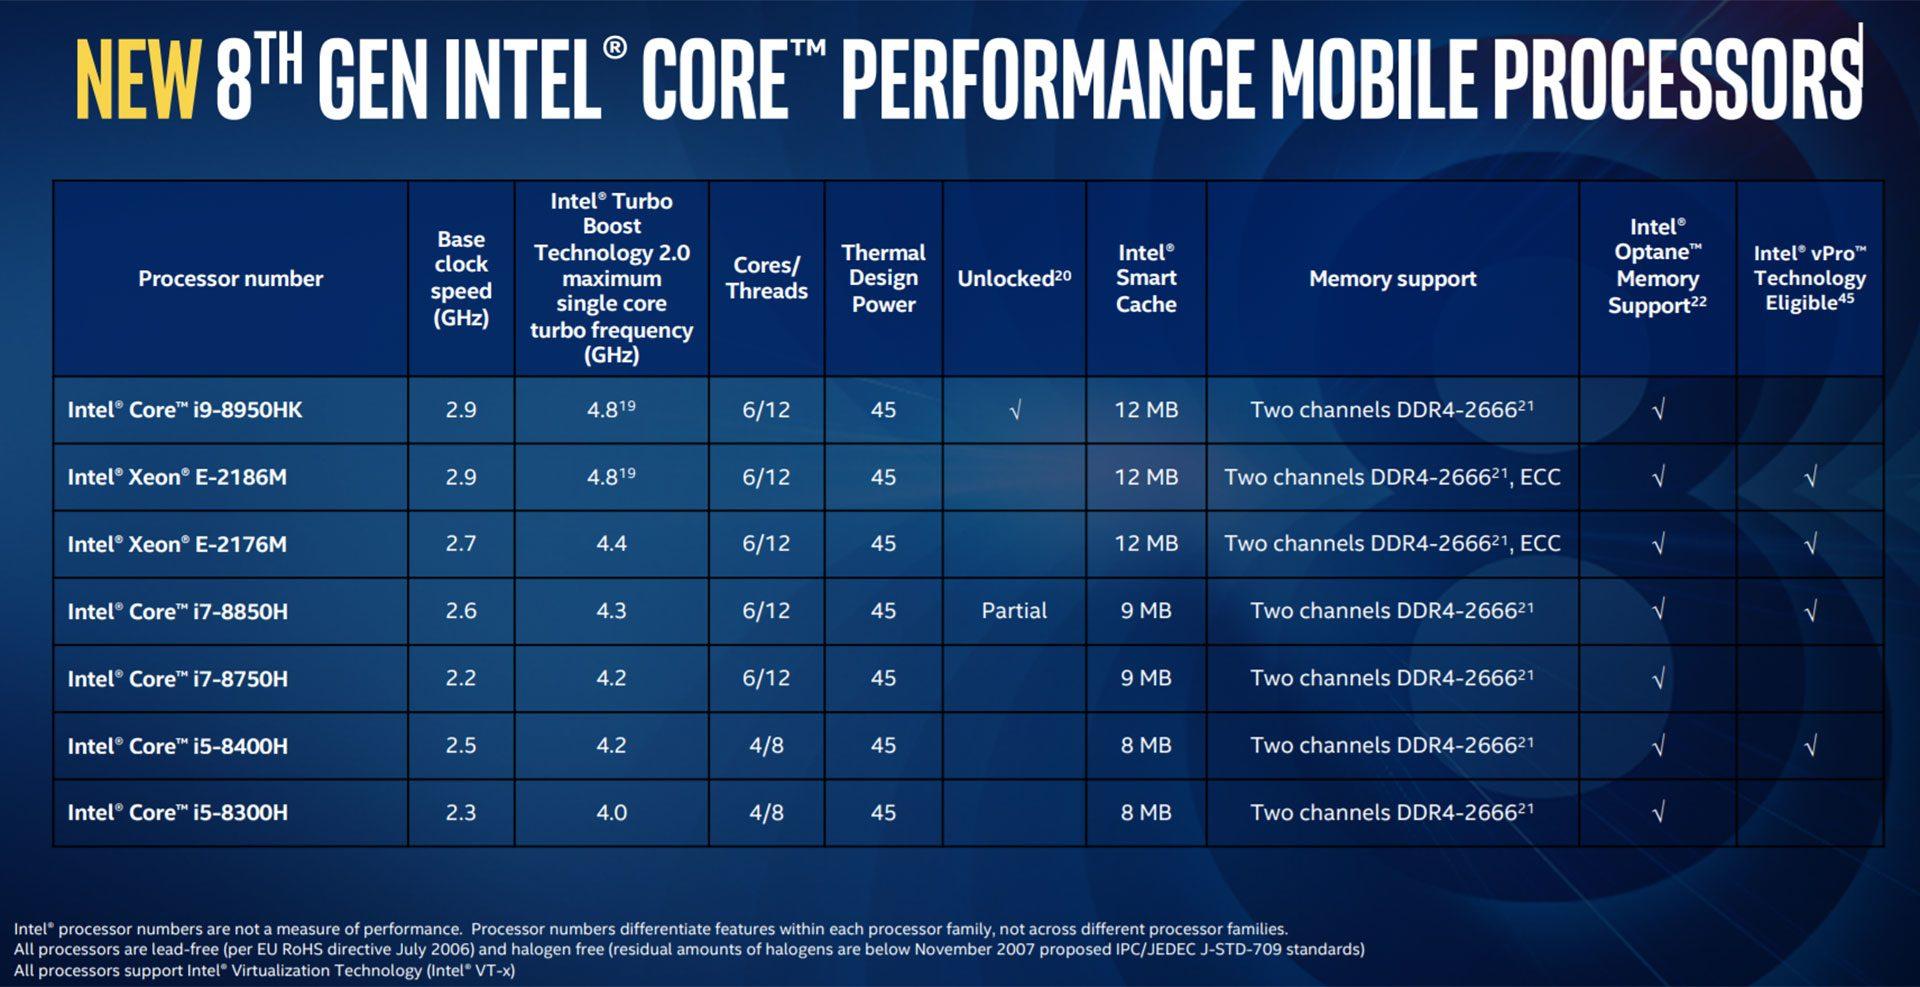 Intel Core i7-8750H benchmarks (Coffee Lake, 8th gen) vs i7-7700HQ